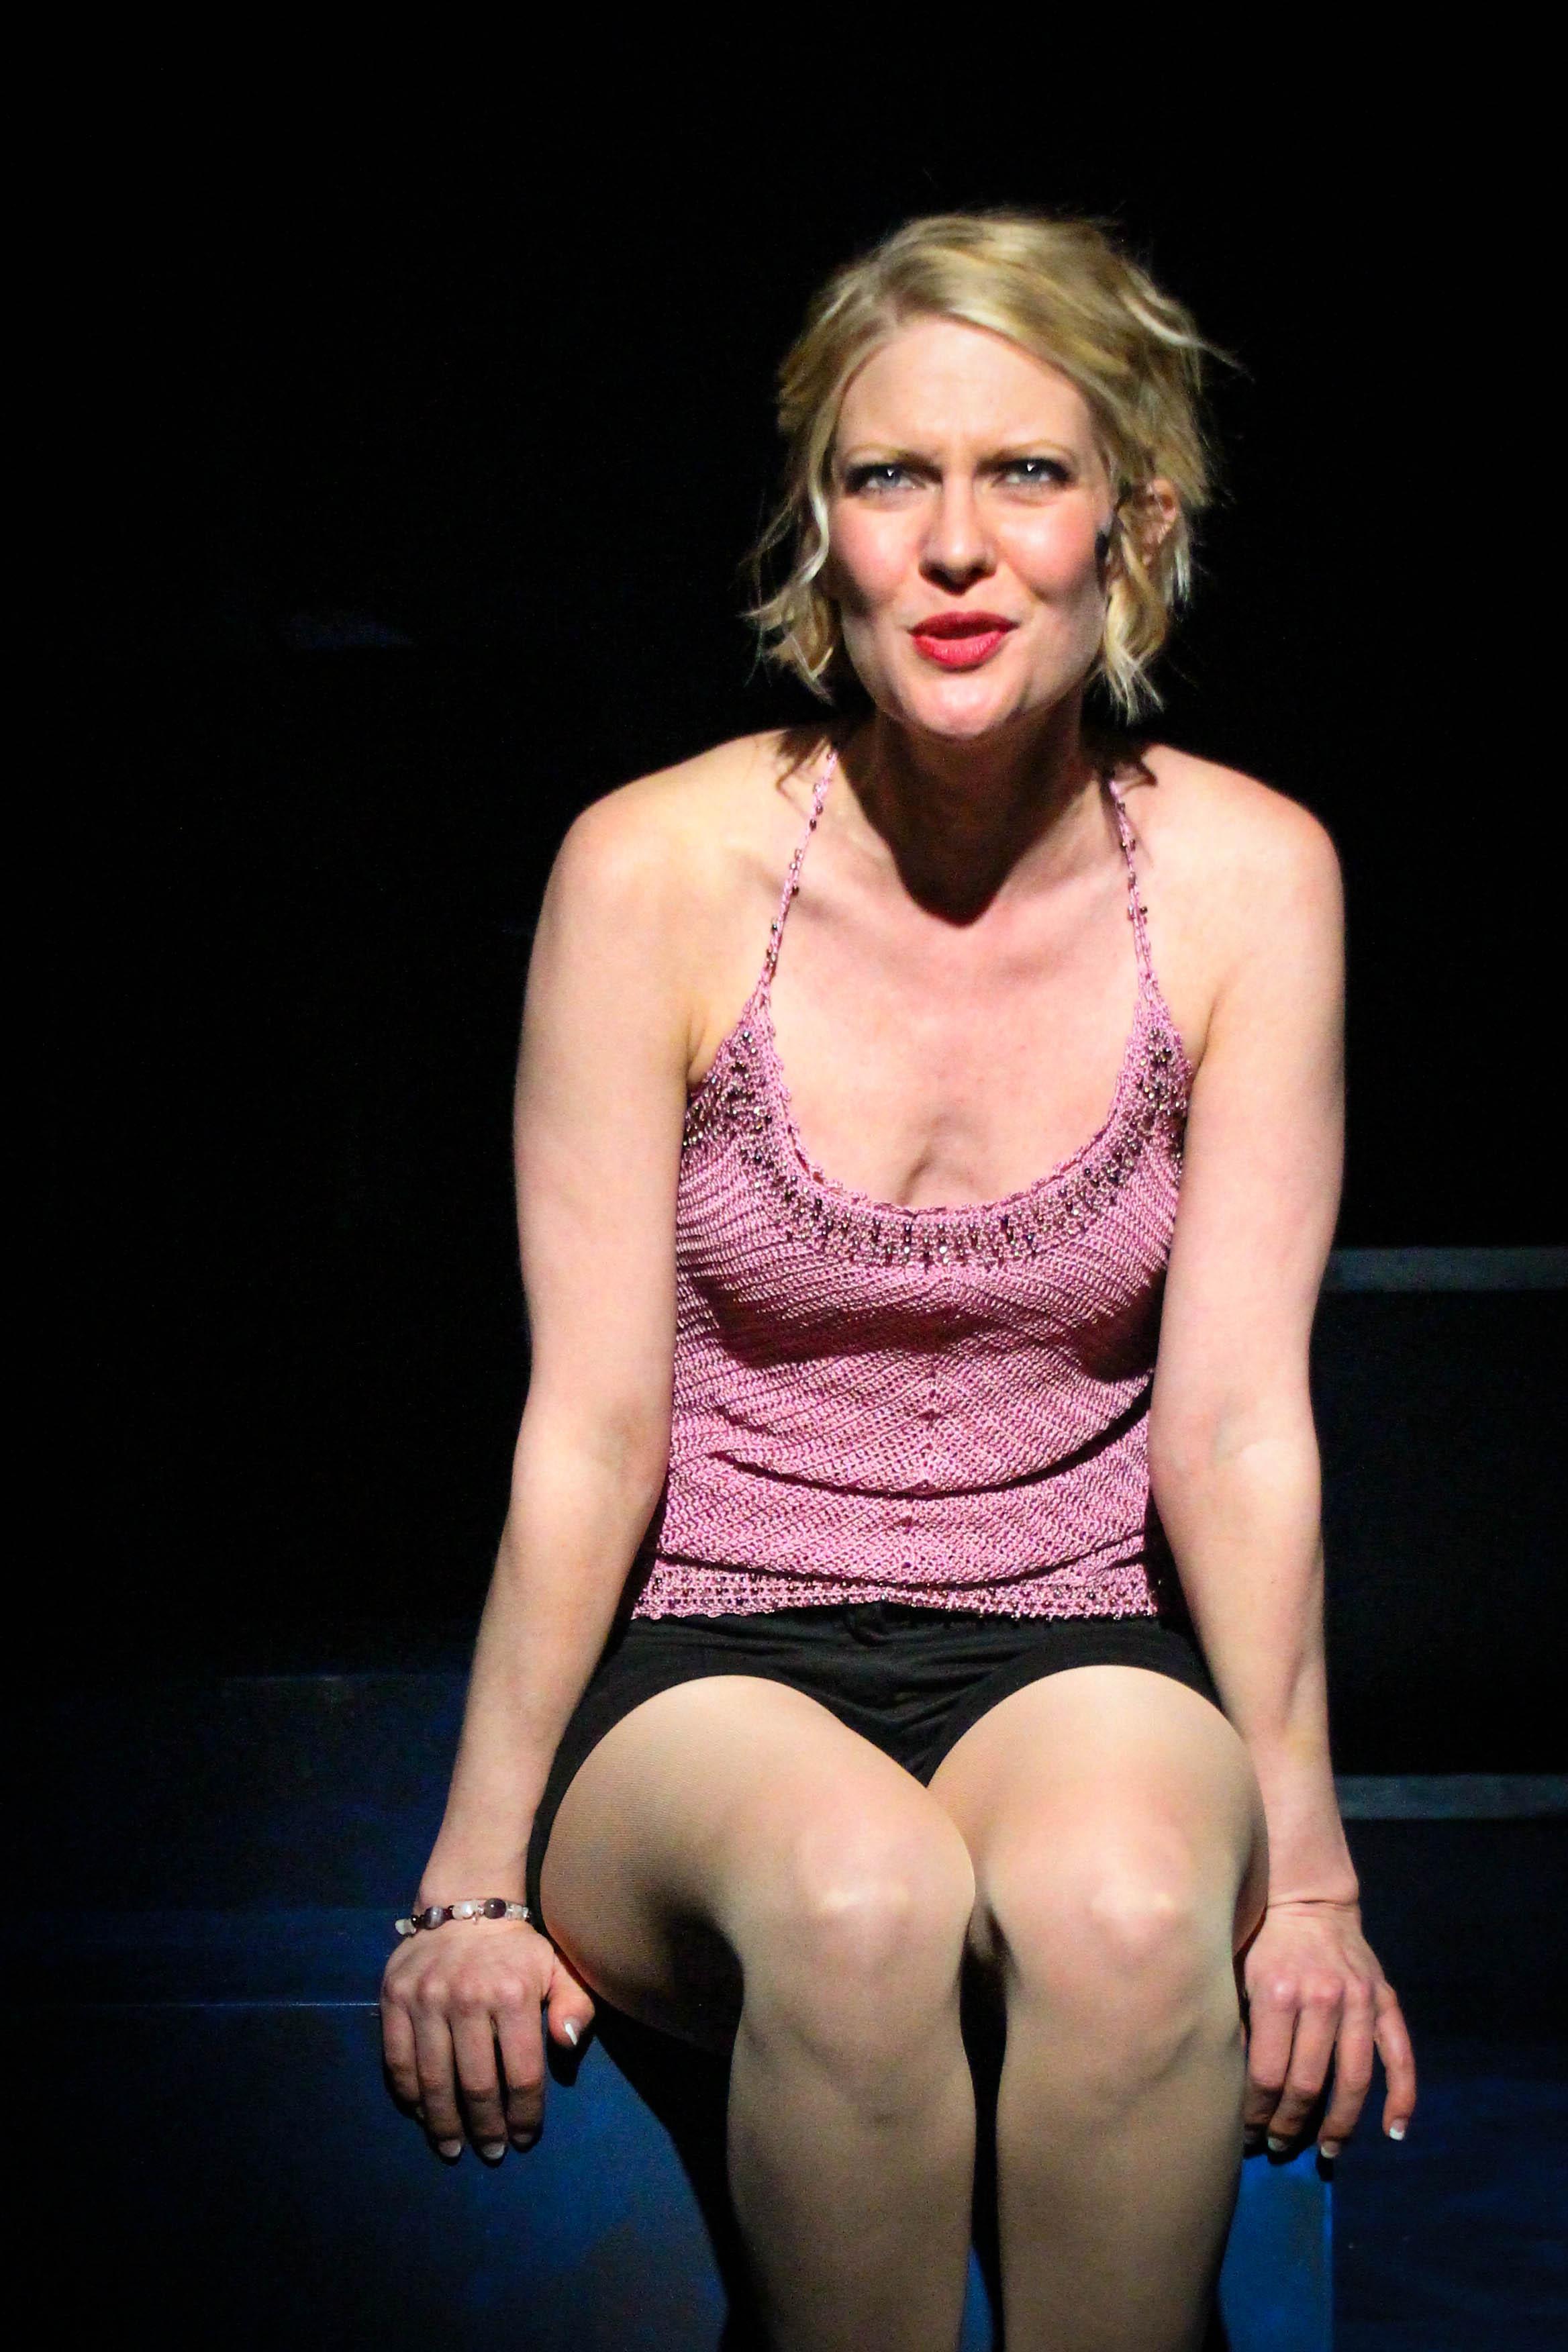 Jennifer Malenke